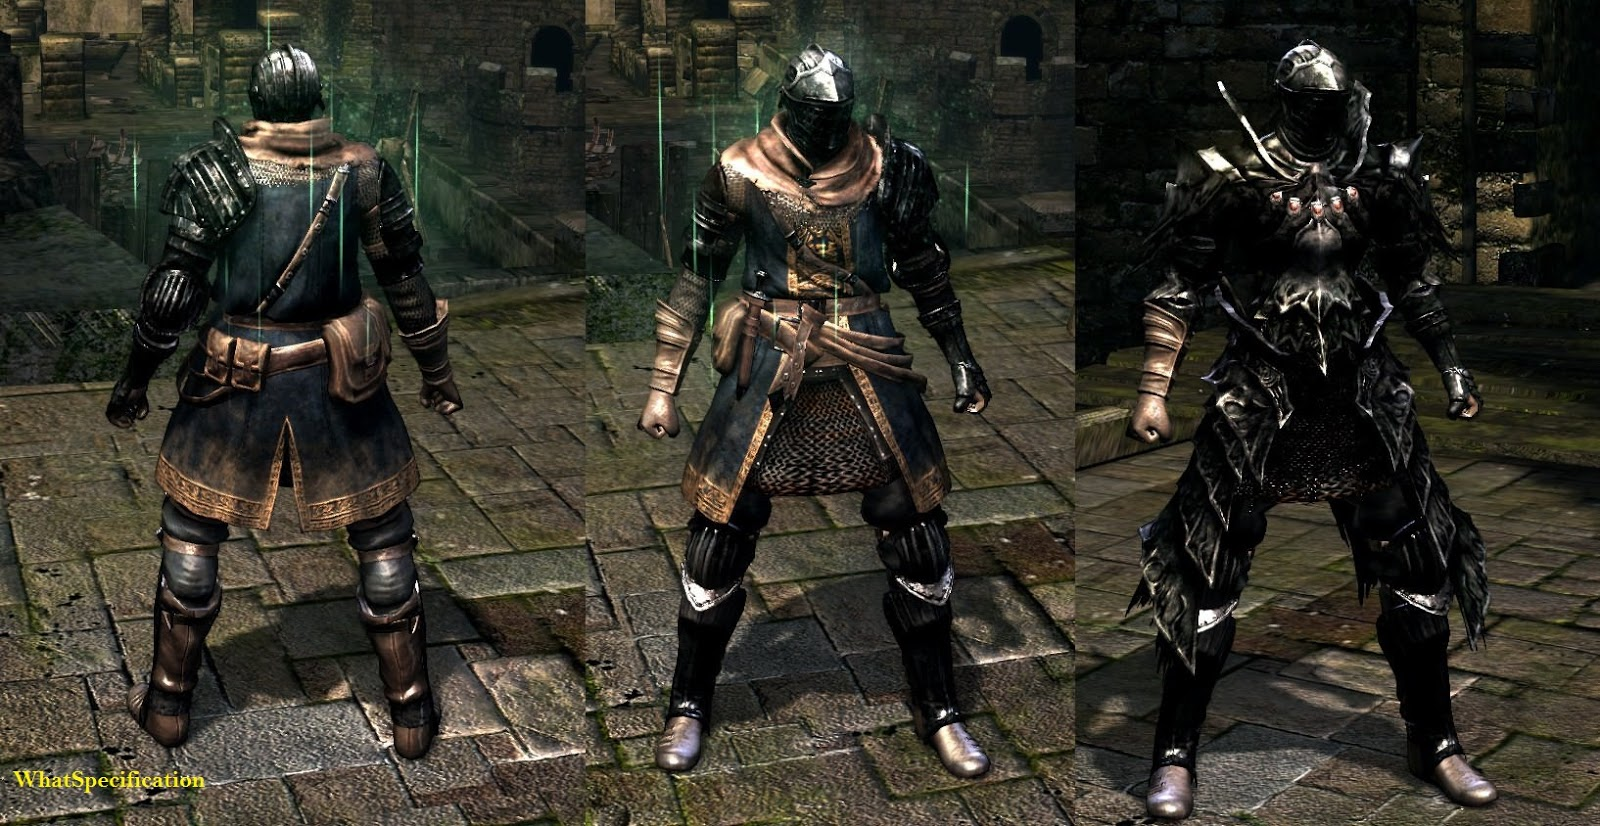 Dark Souls Is A  Plex RPG That Takes A More Bare Bone Approach